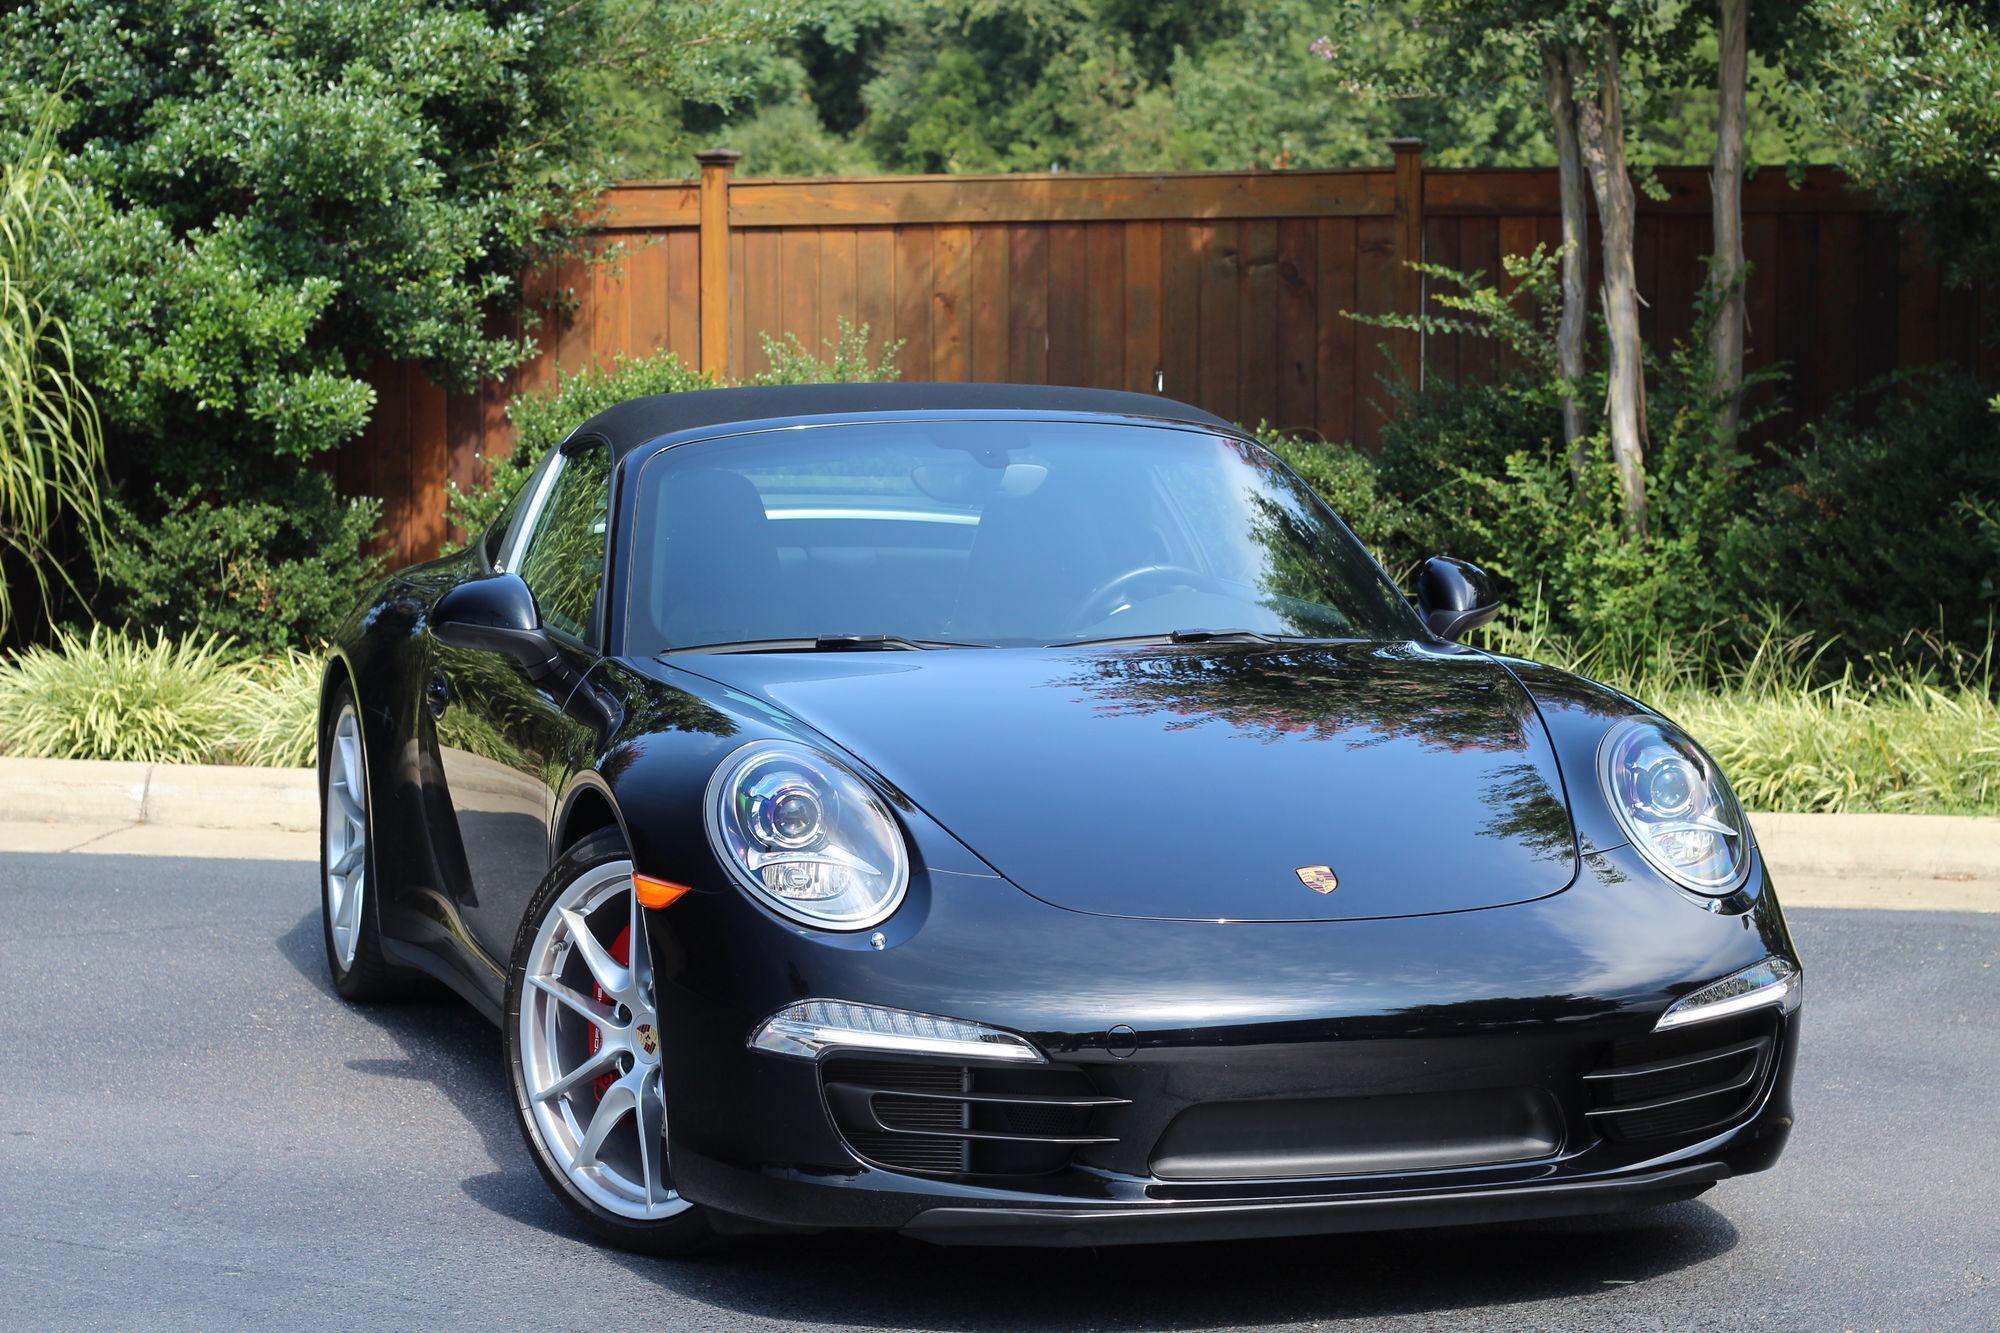 Porsche dynamic light system pdls launch vehicle black standard interior in black power 14 way seats premium package plus